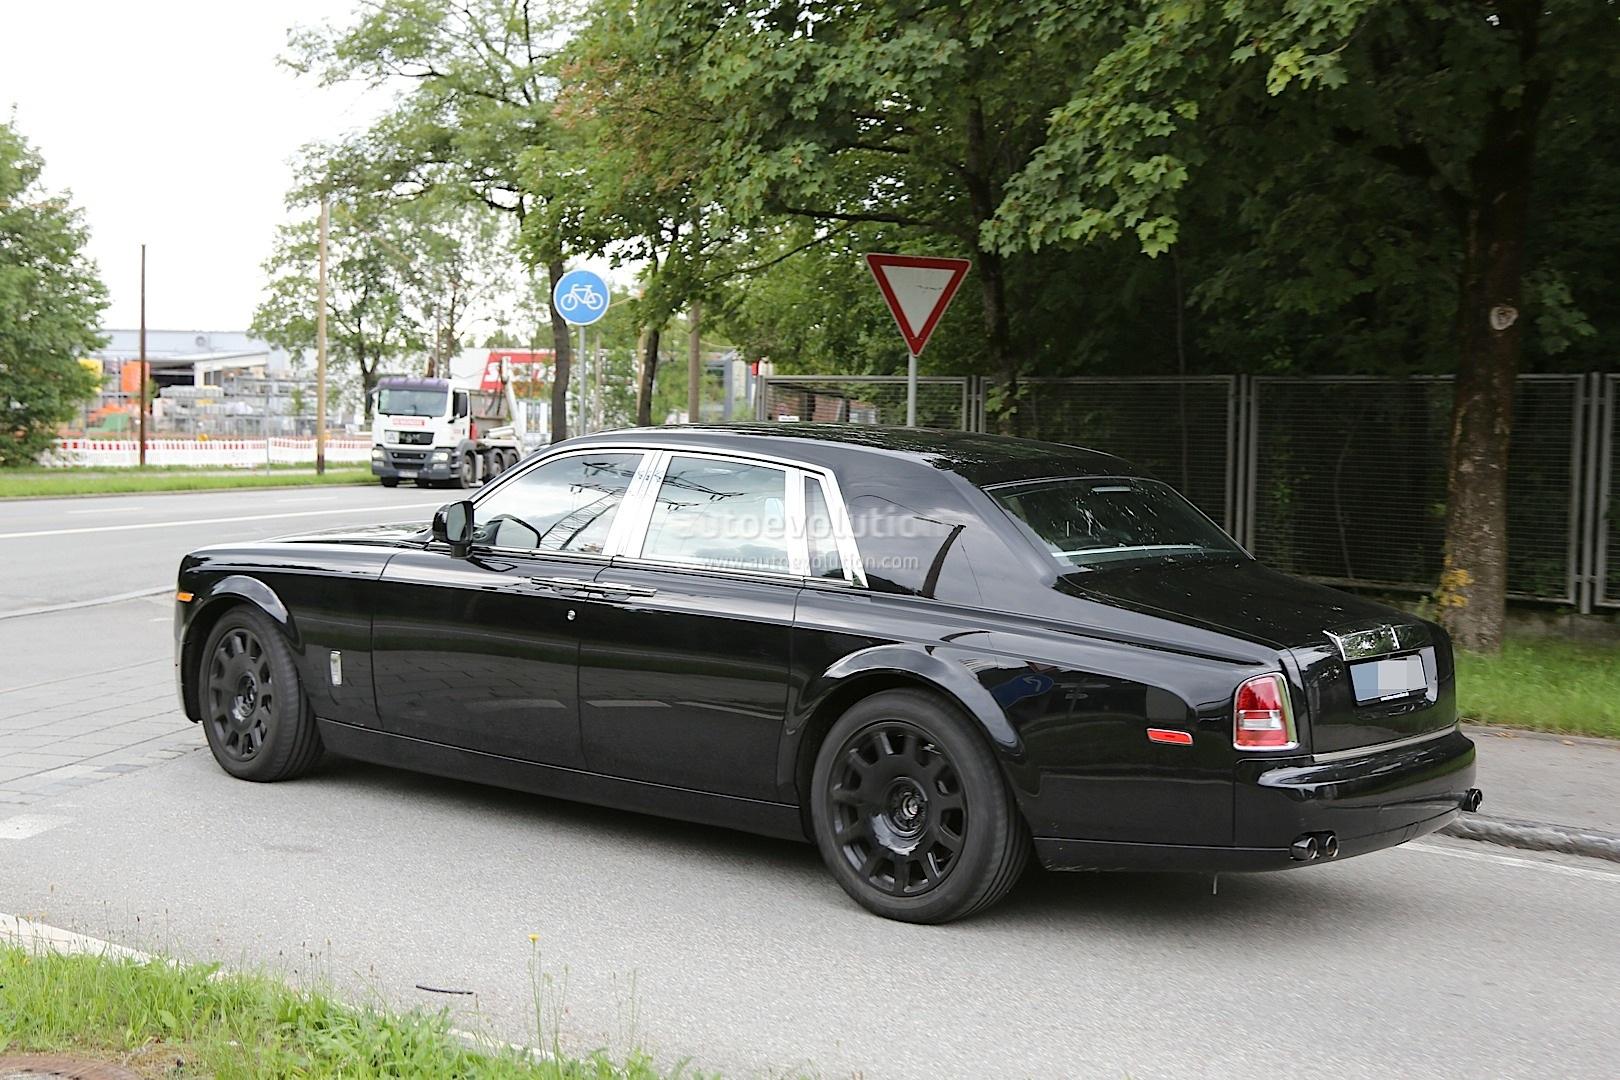 Next Generation Rolls Royce Phantom Spyshots ...